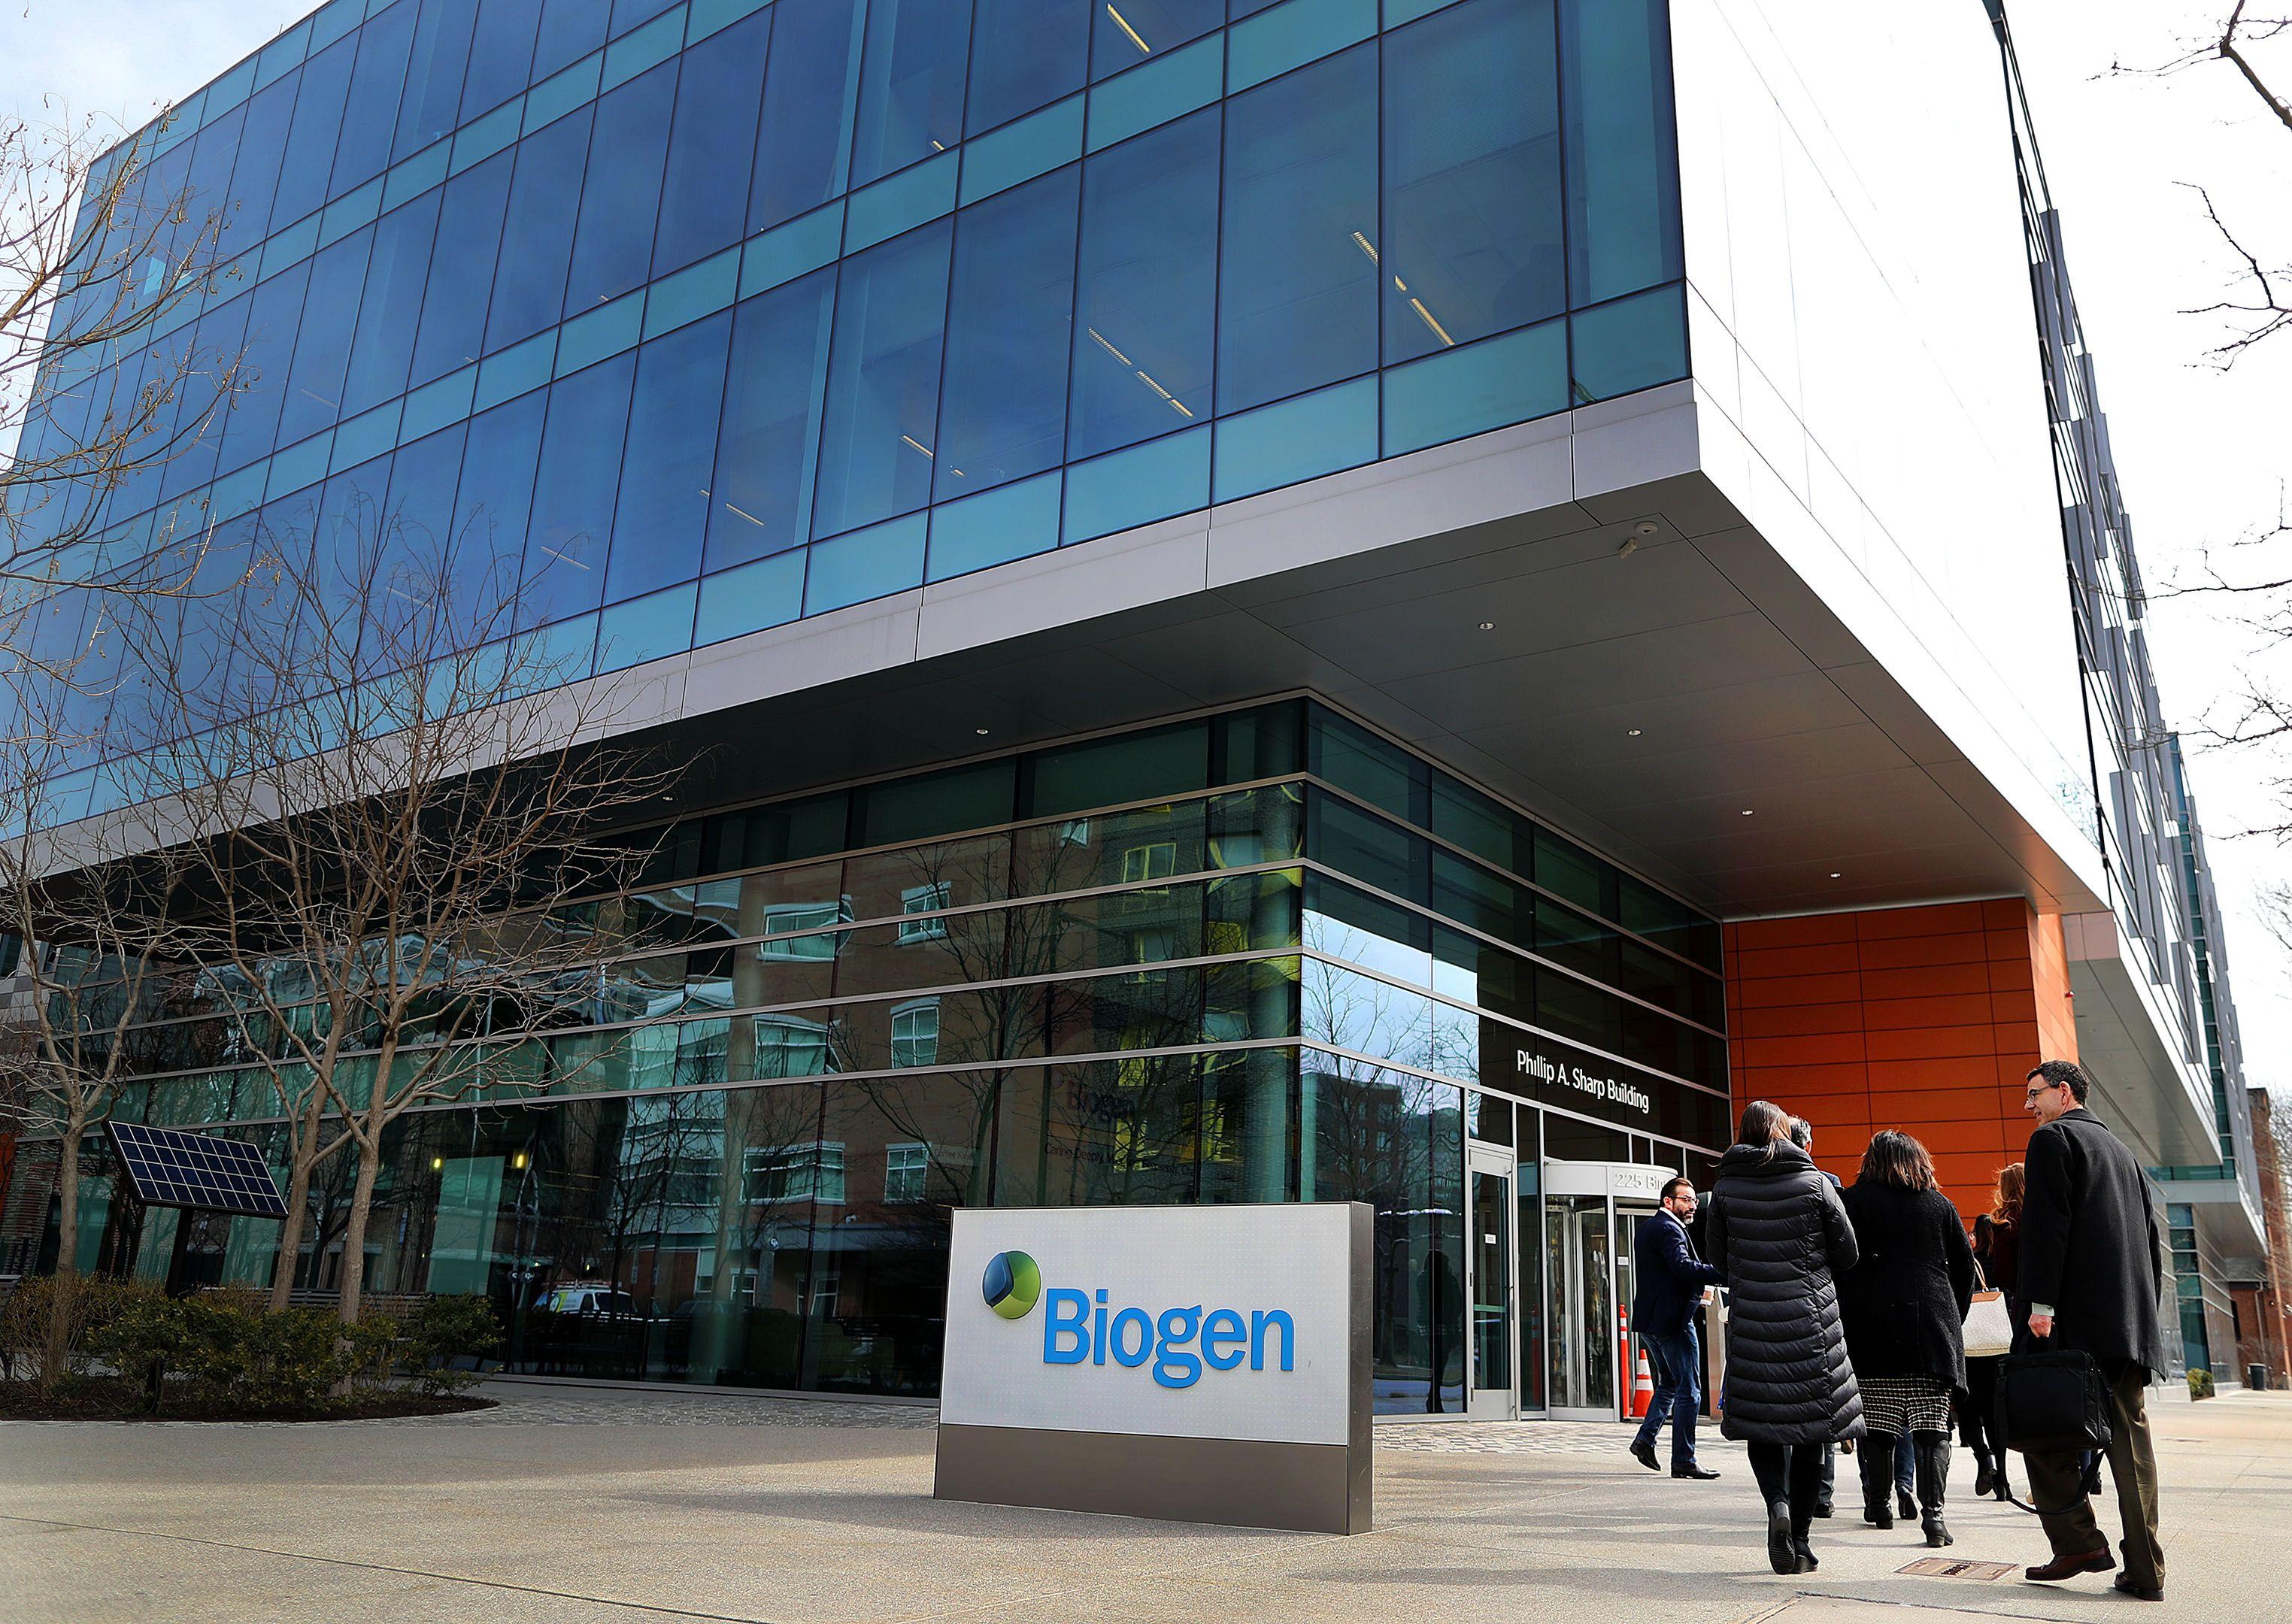 Biogen brings in Warren Buffett, loses Ray Dalio - Axios